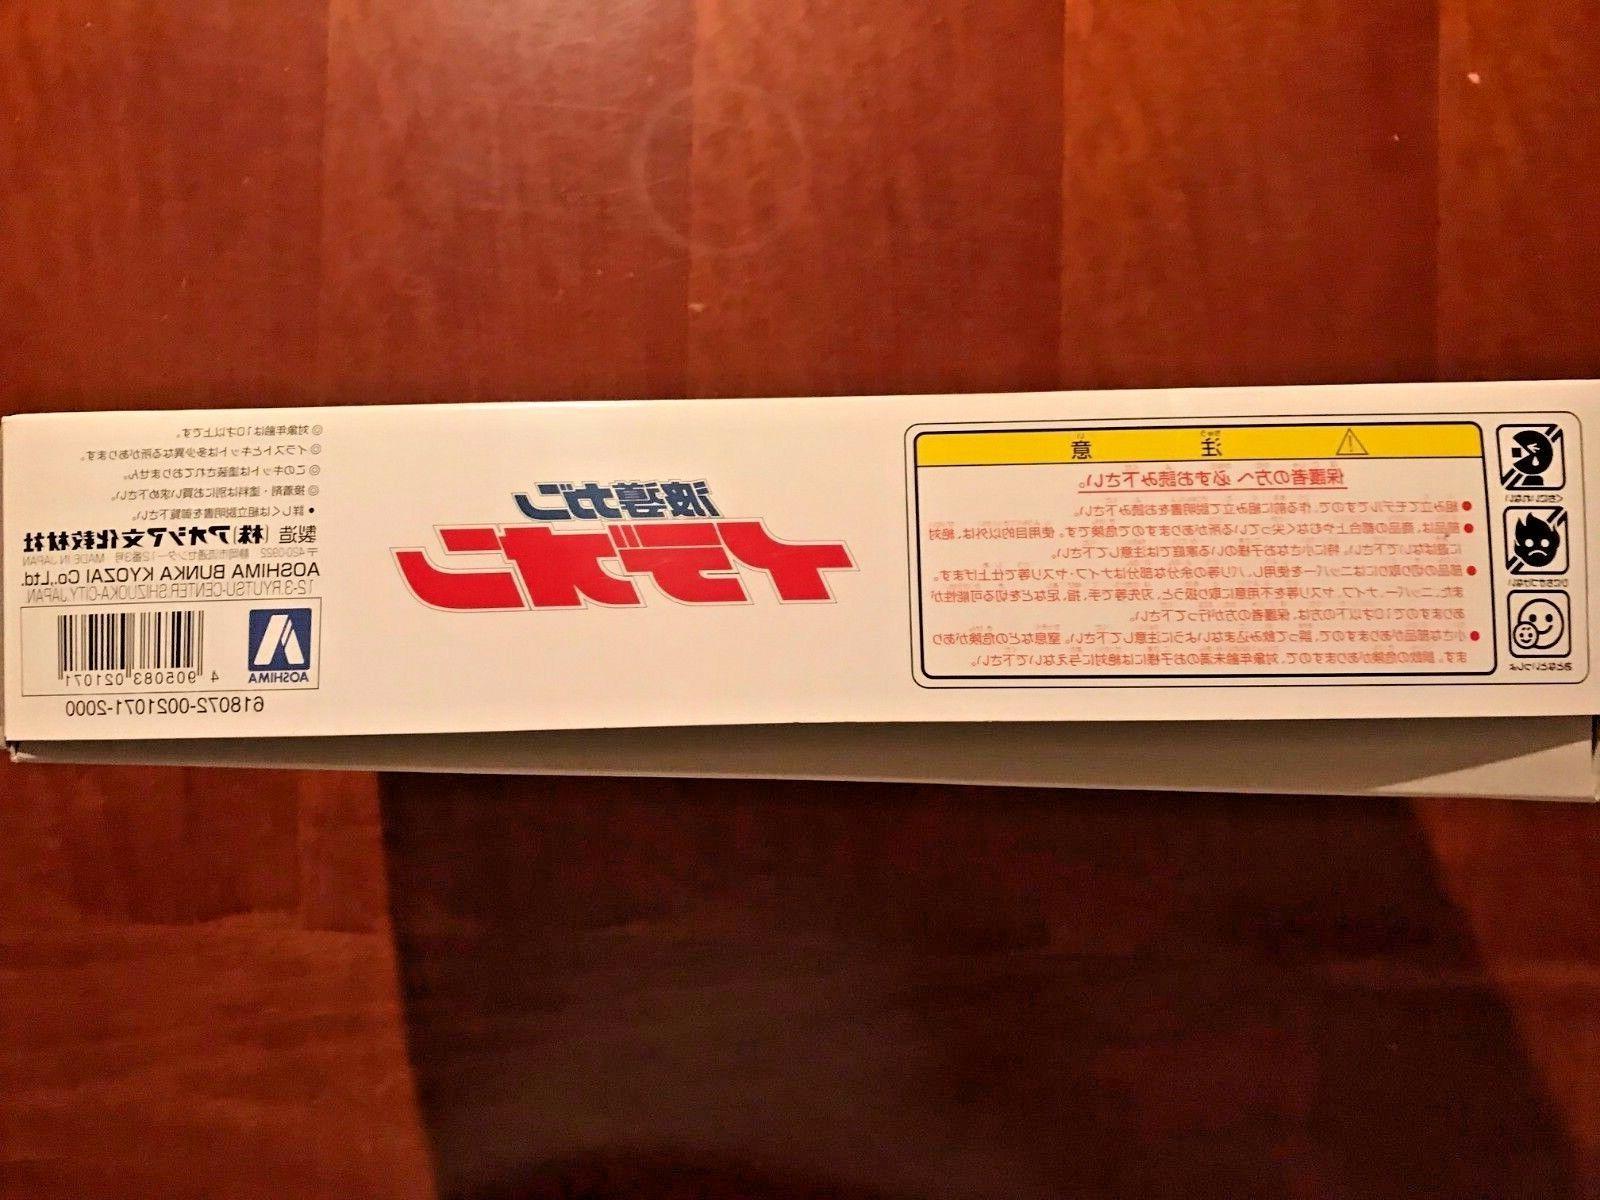 Aoshima Runaway 1/600 Scale Plastic Model Kit